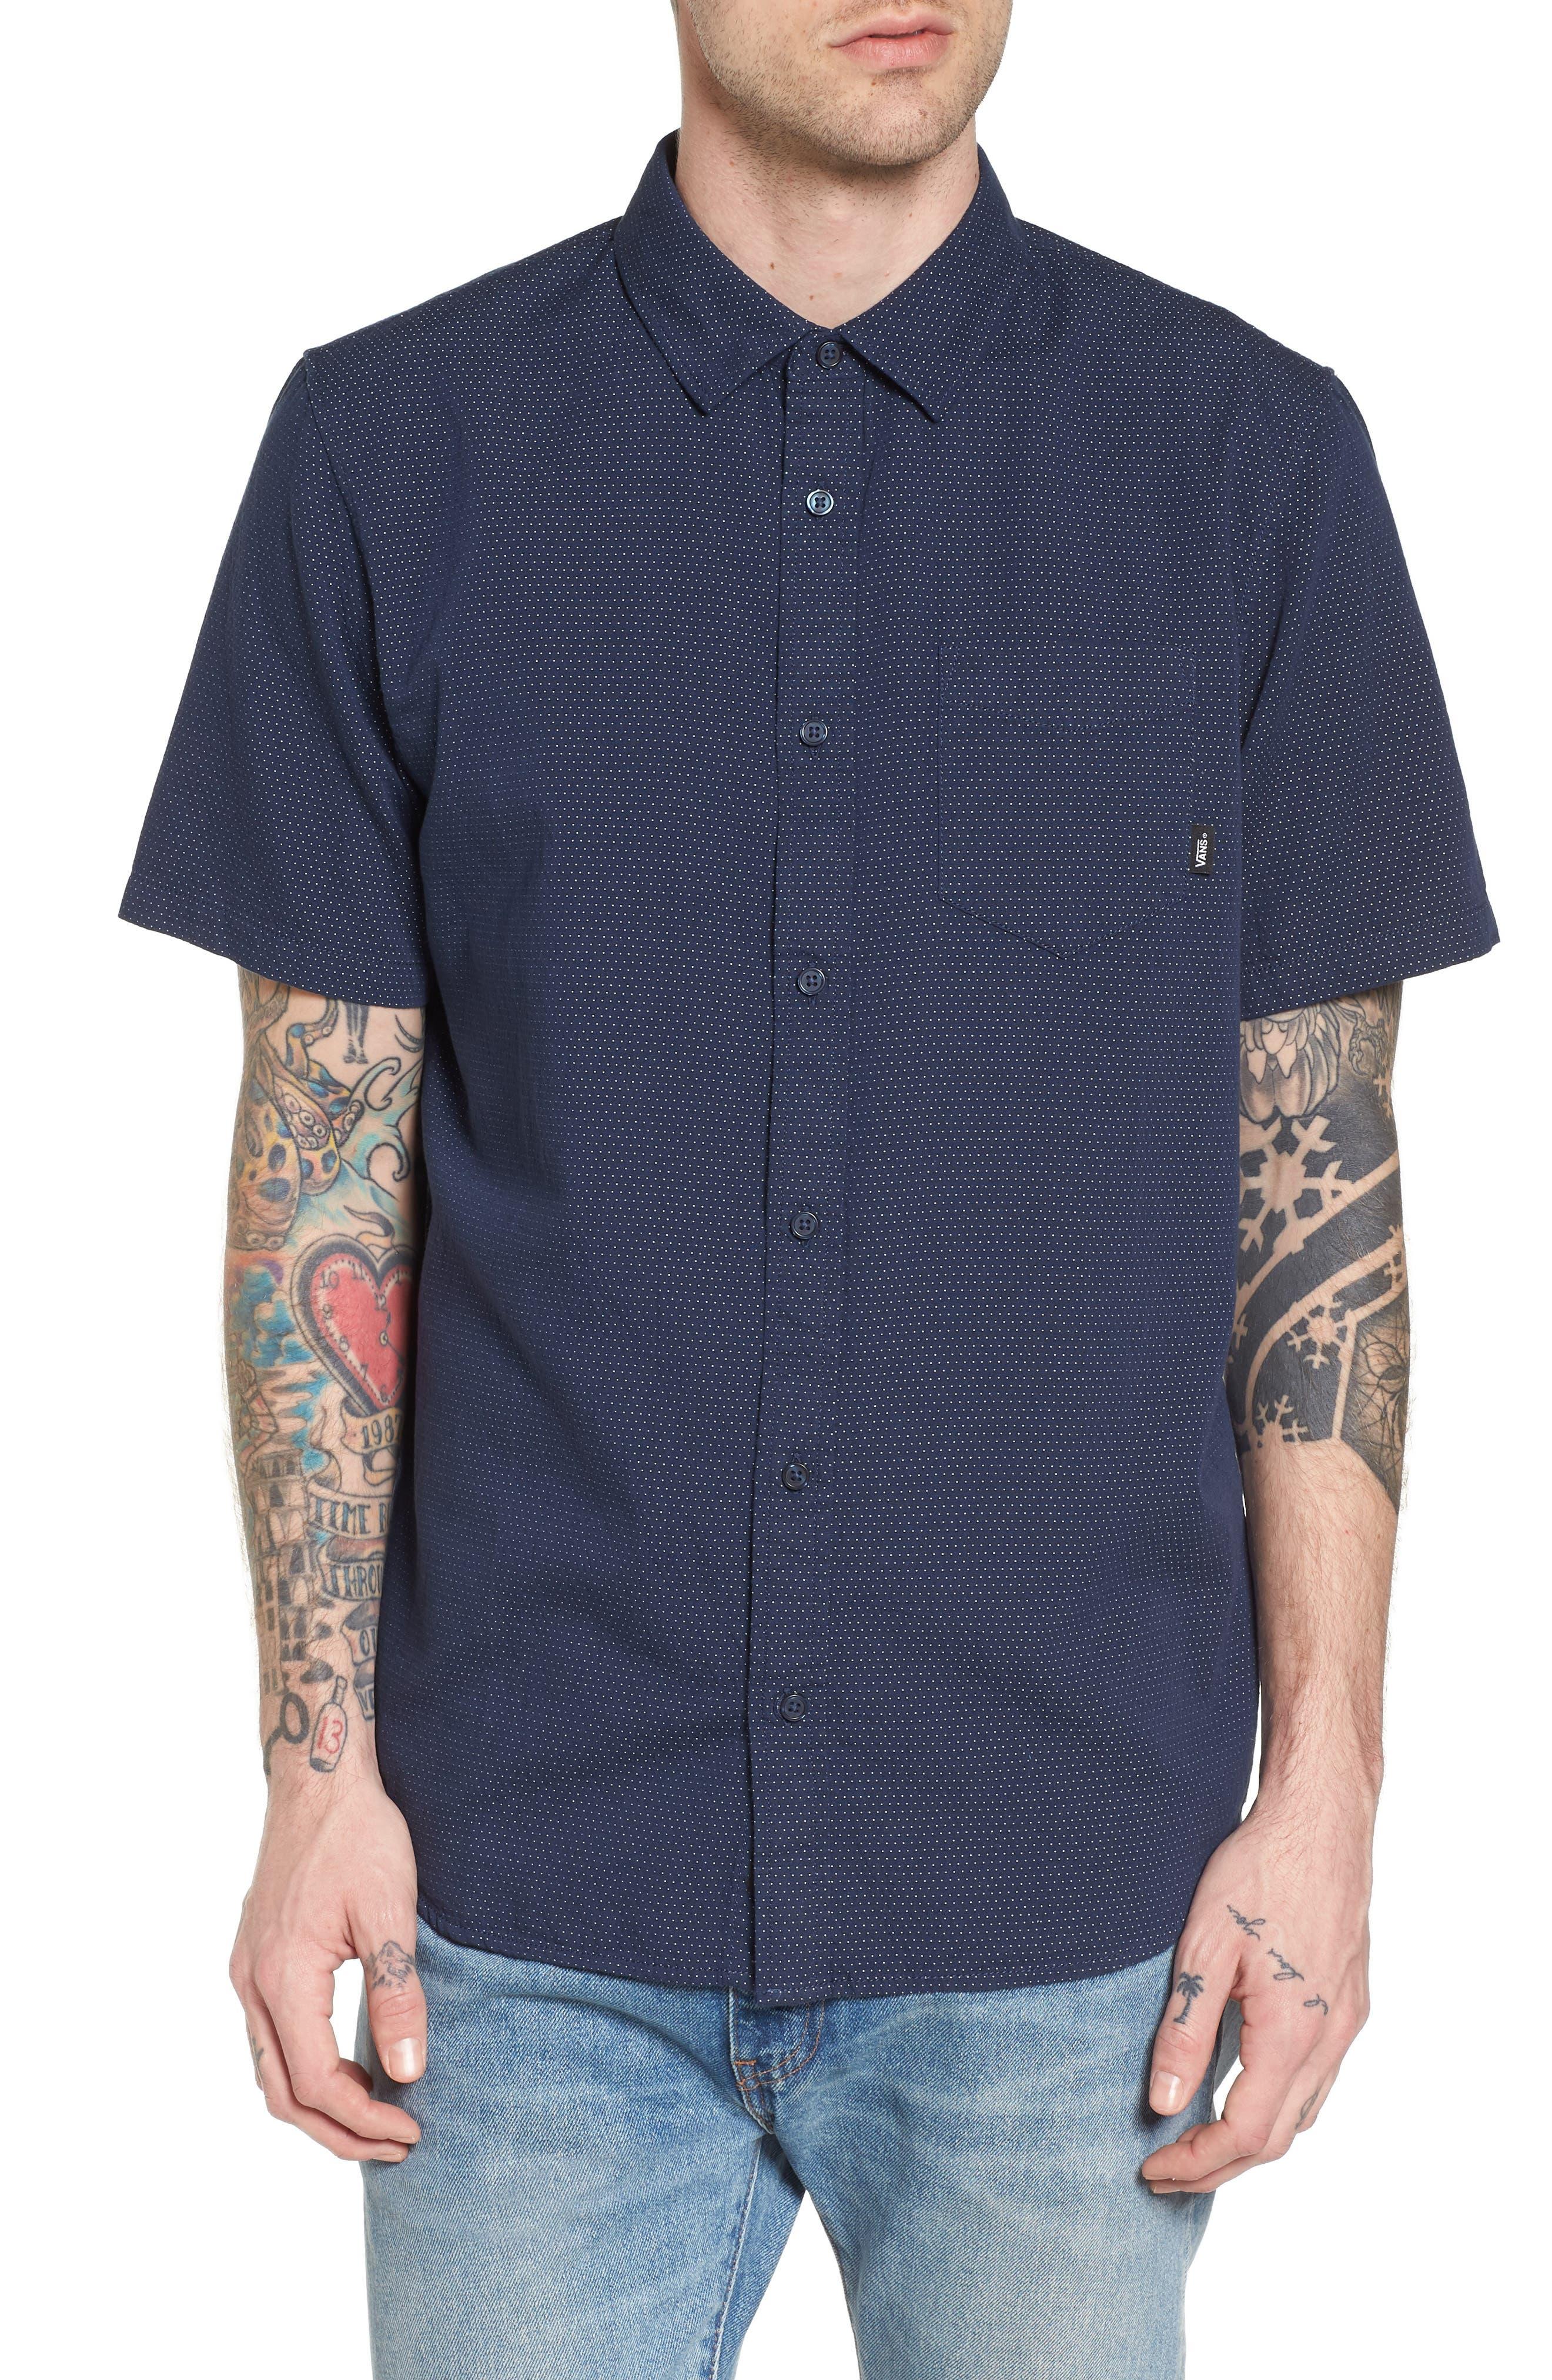 Giddings Short Sleeve Shirt,                         Main,                         color, 401